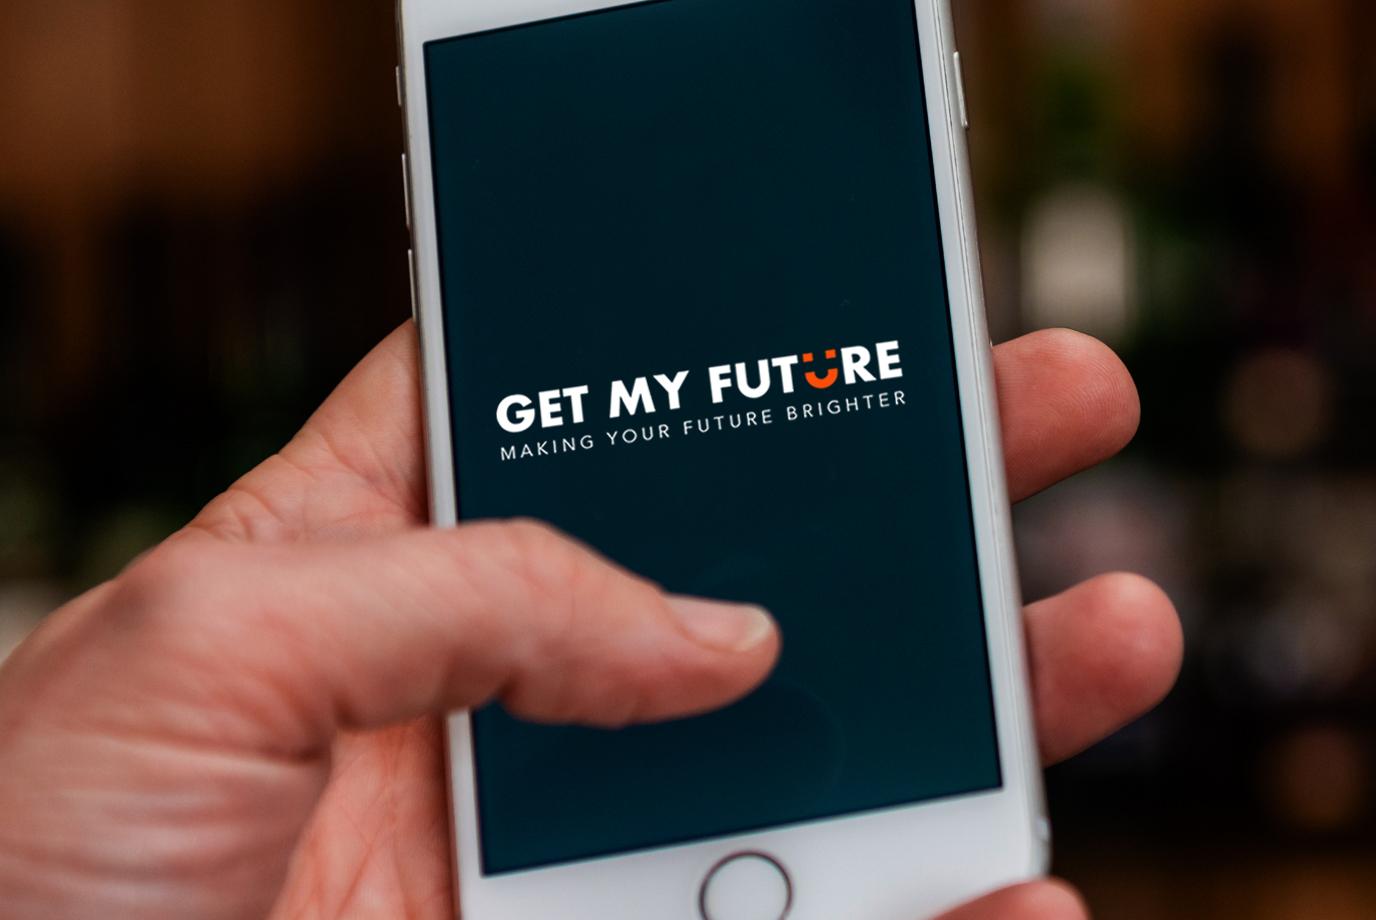 Get My Future